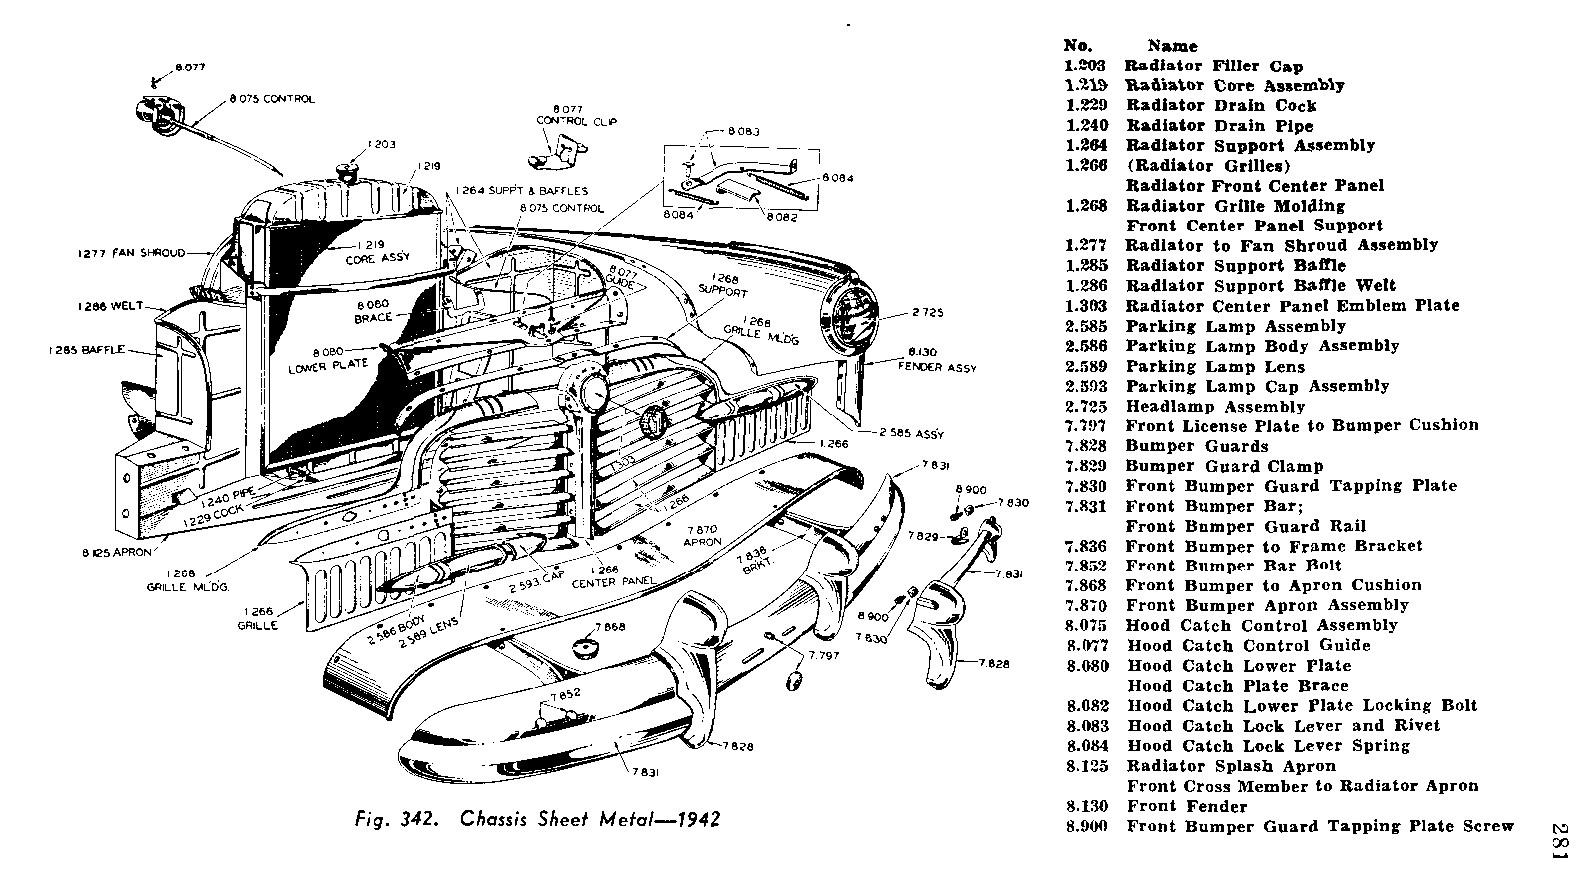 1941 Pontiac Shop Manual- Sheet Metal Page 3 of 11